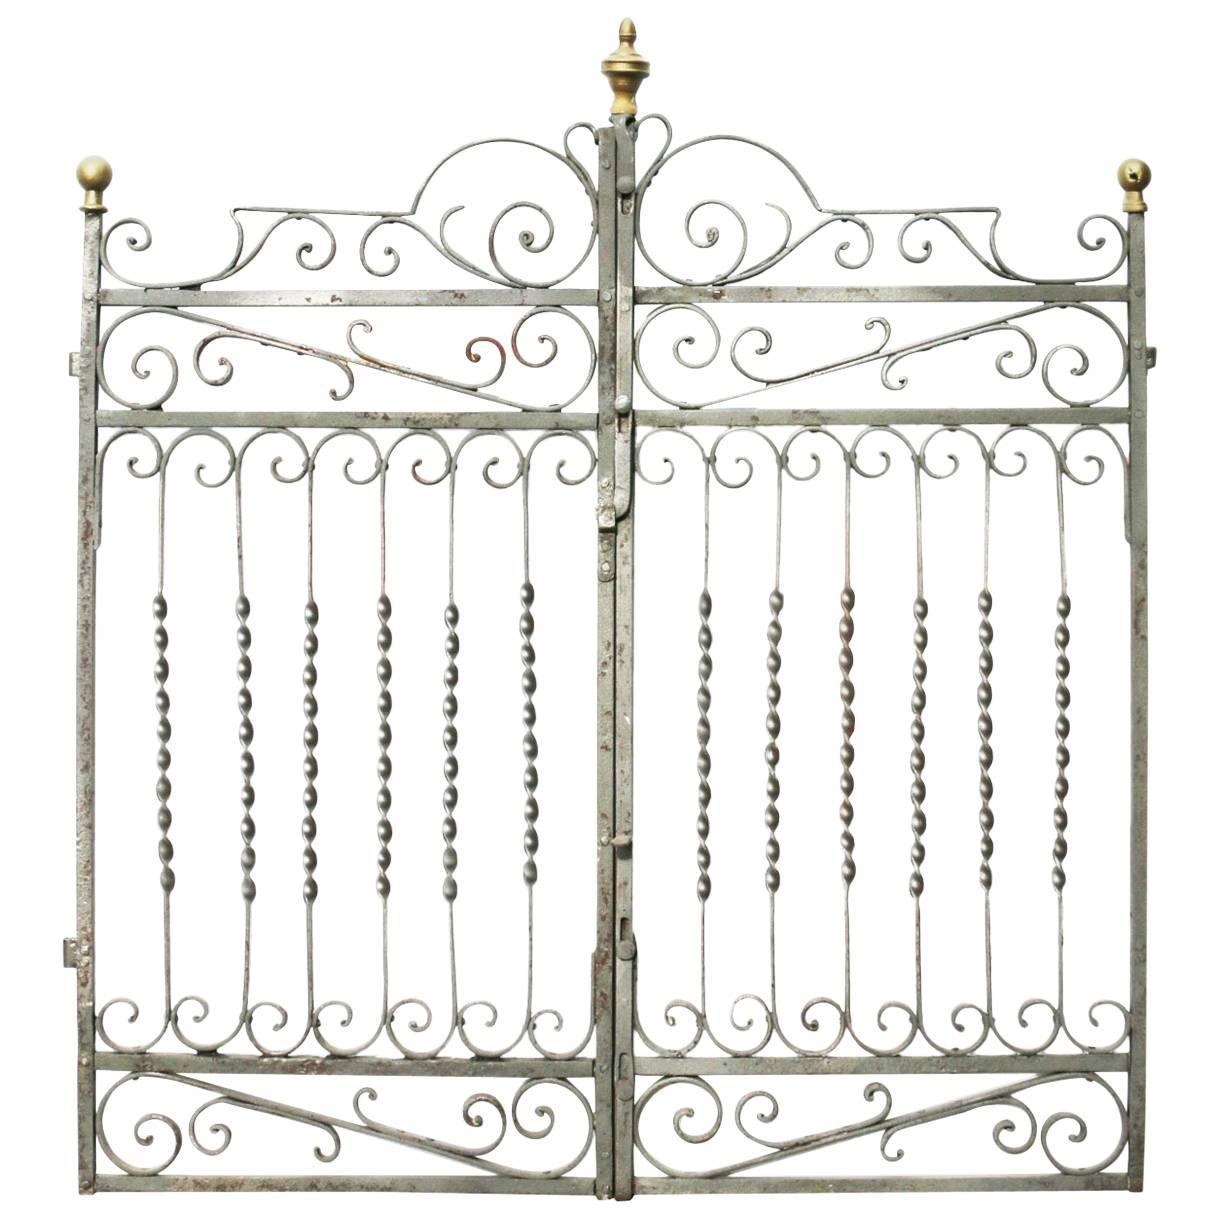 19th Century French Wrought Iron Gates